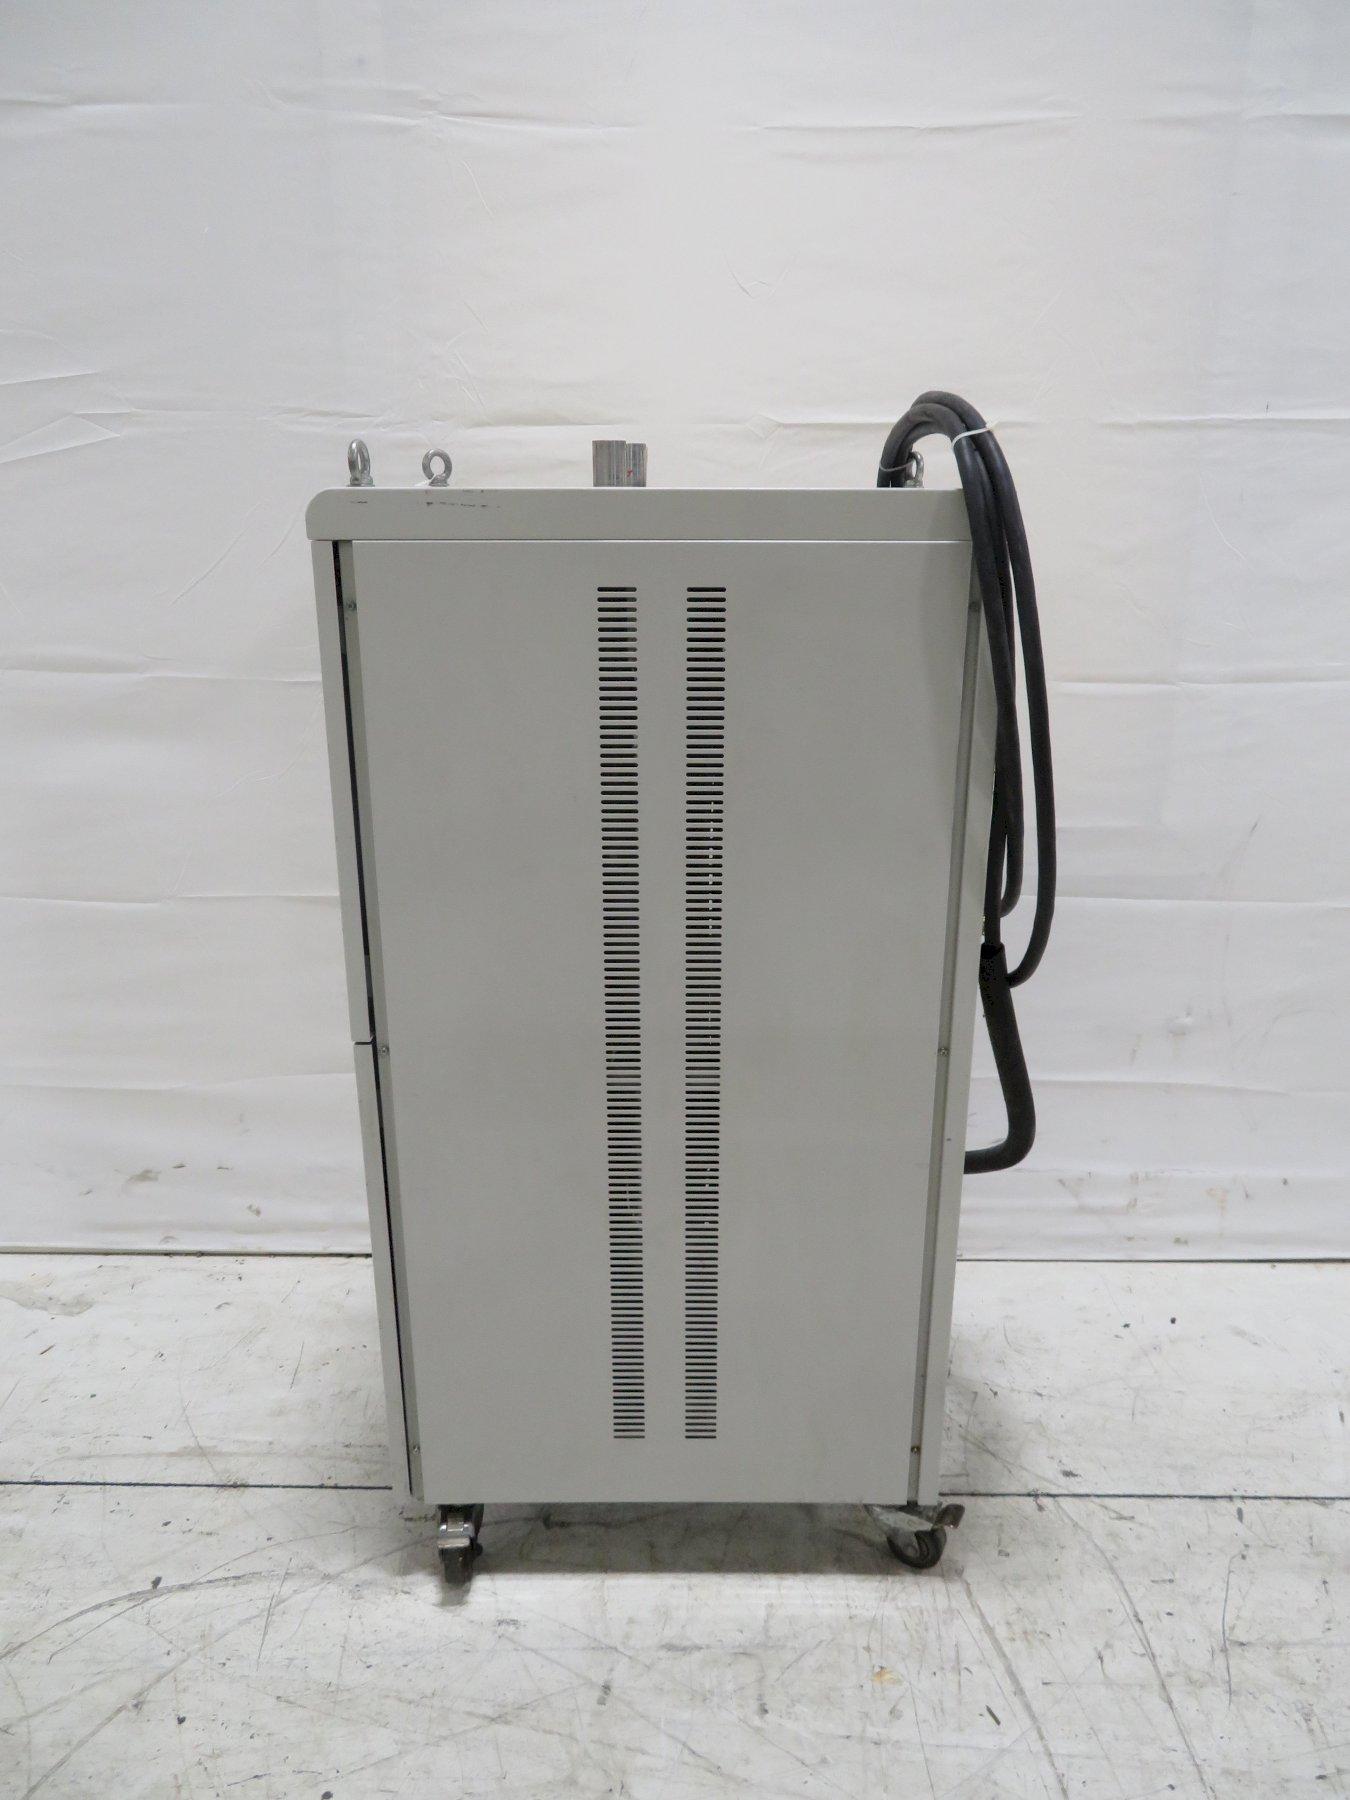 Matsui DMZ2-120 Rotary Desiccant Dryer, Approx 100-150 lb/hr, 230V, Yr. 2012